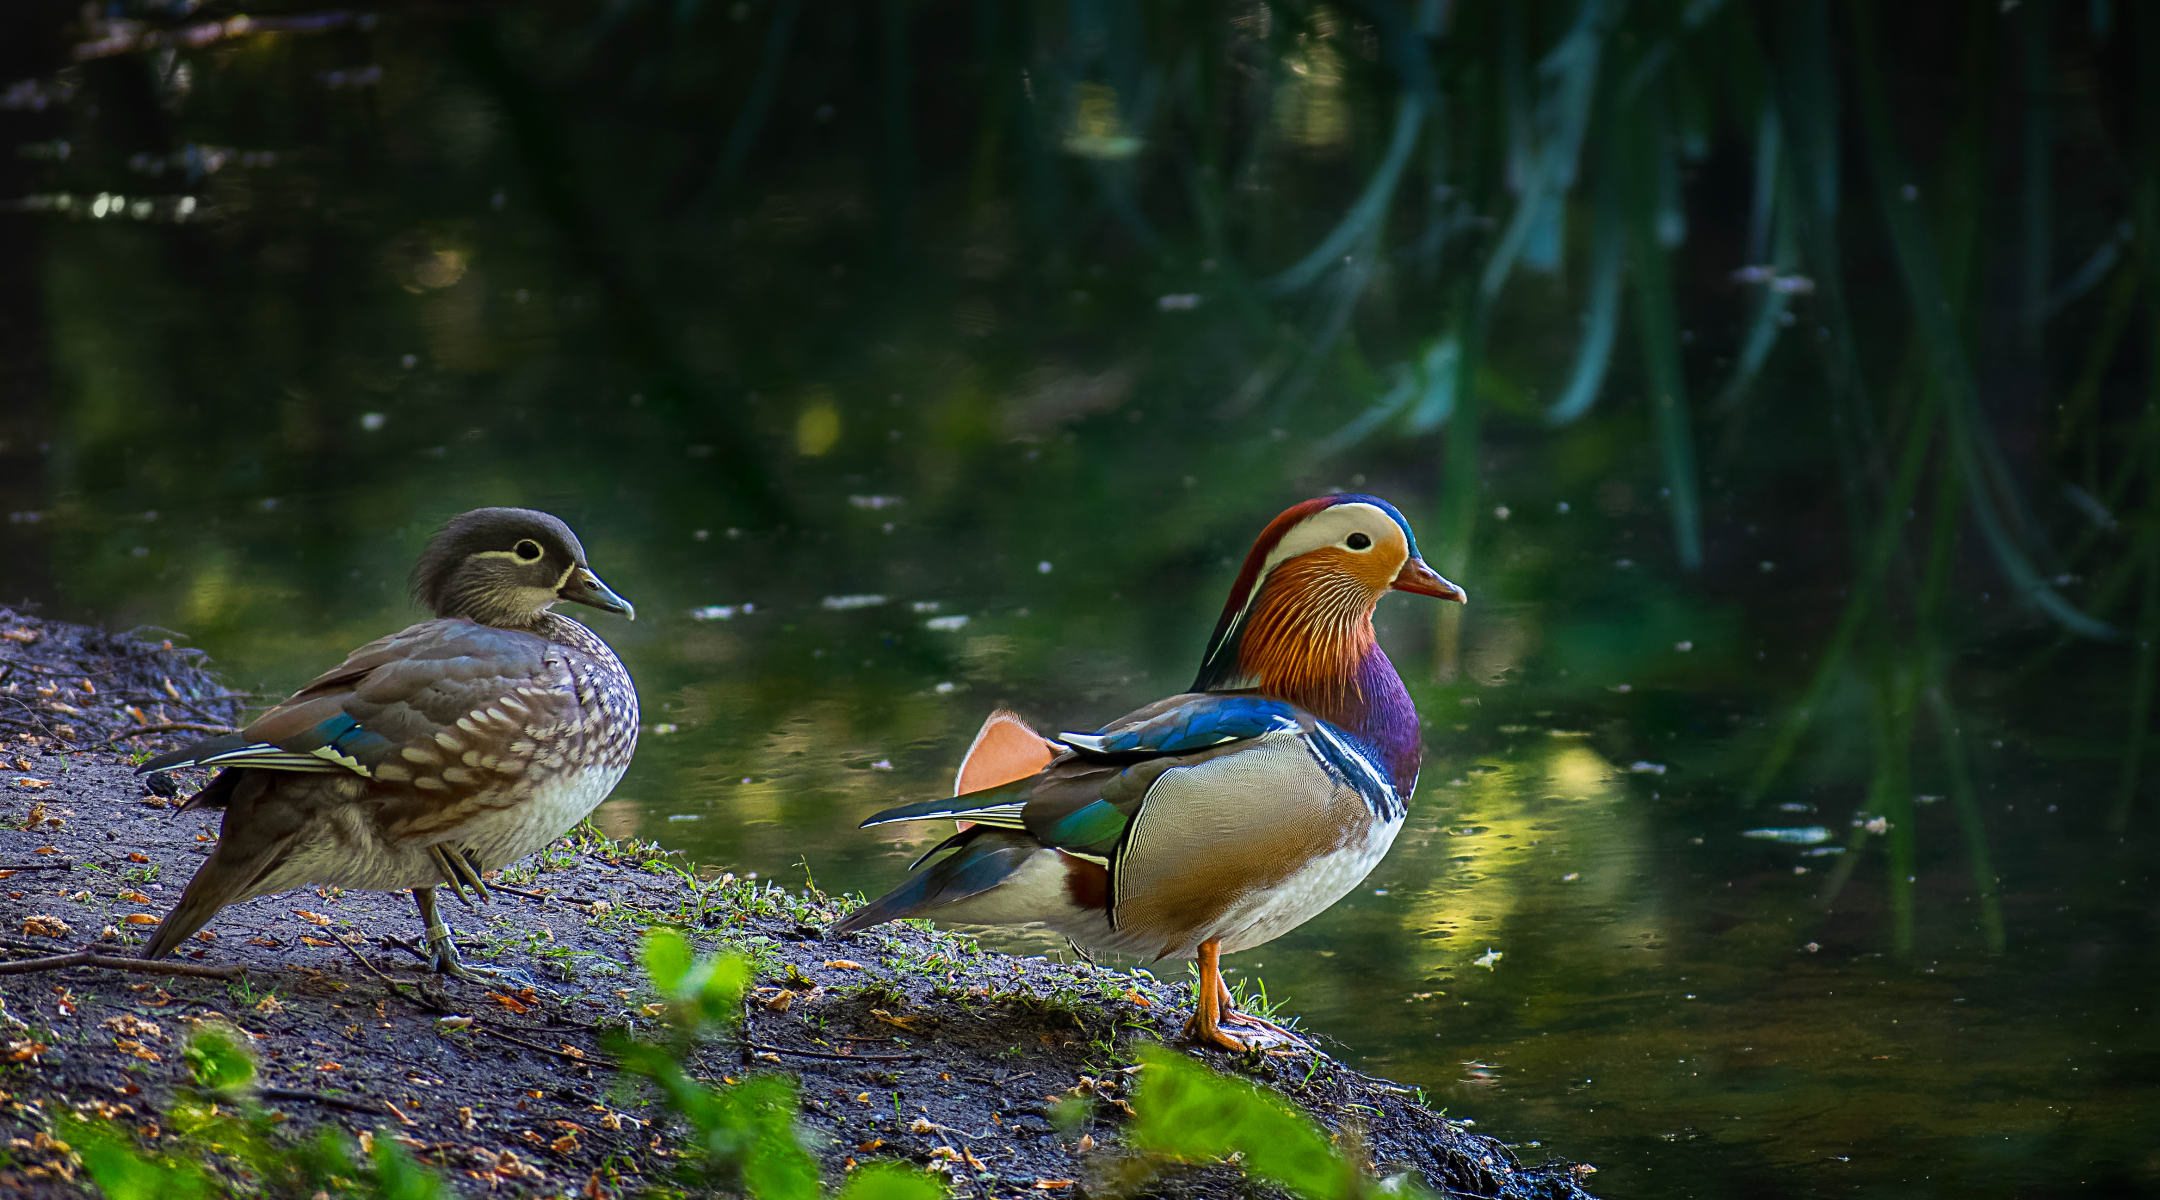 magical mandarin ducks at edge of pond